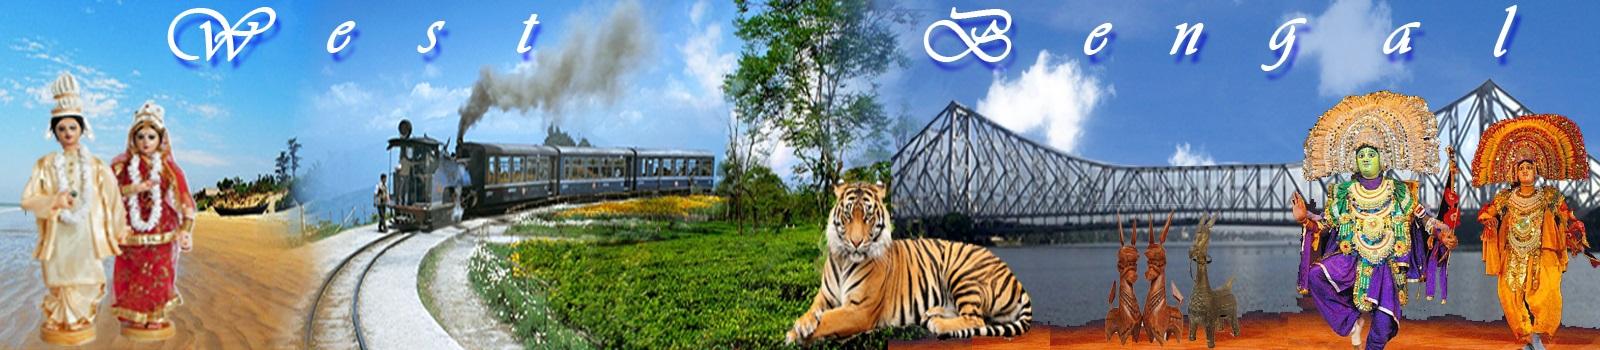 west-bengal-city